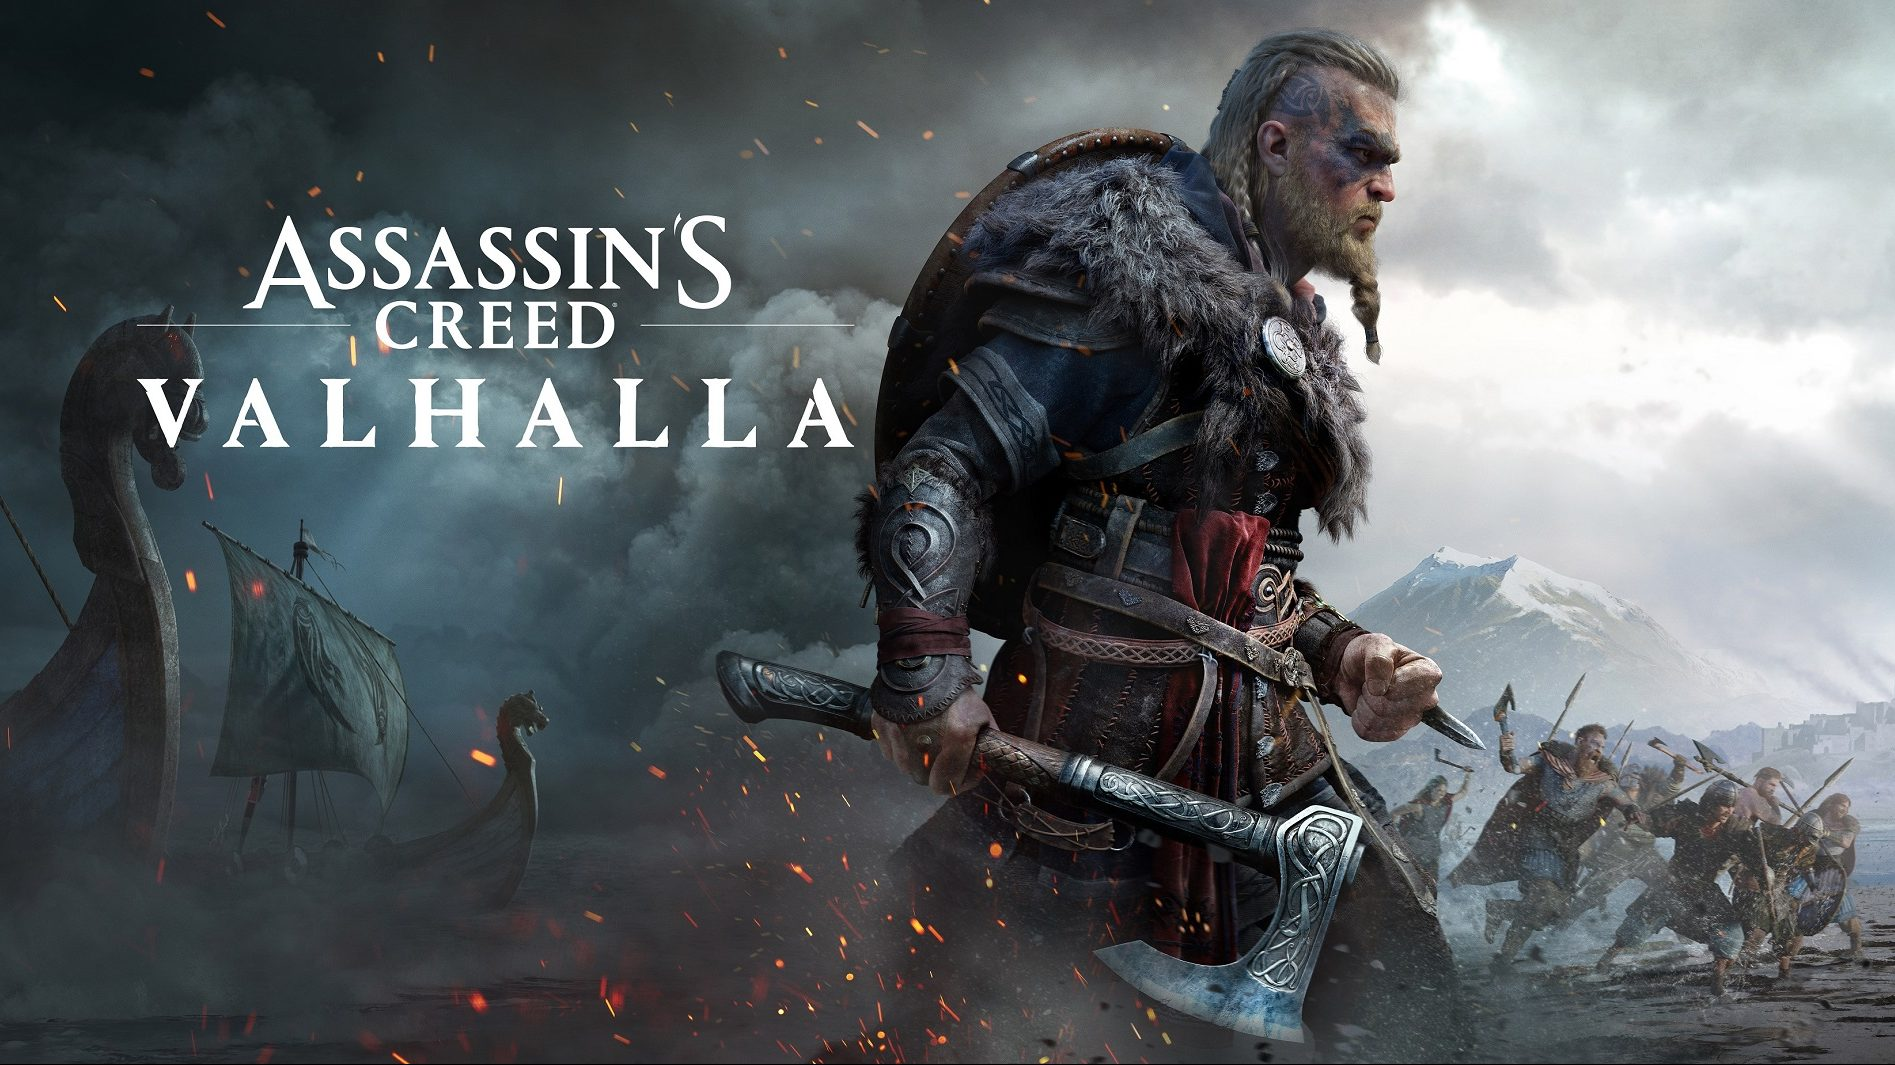 Assassin's Creed: Valhalla sur jdrpg.fr